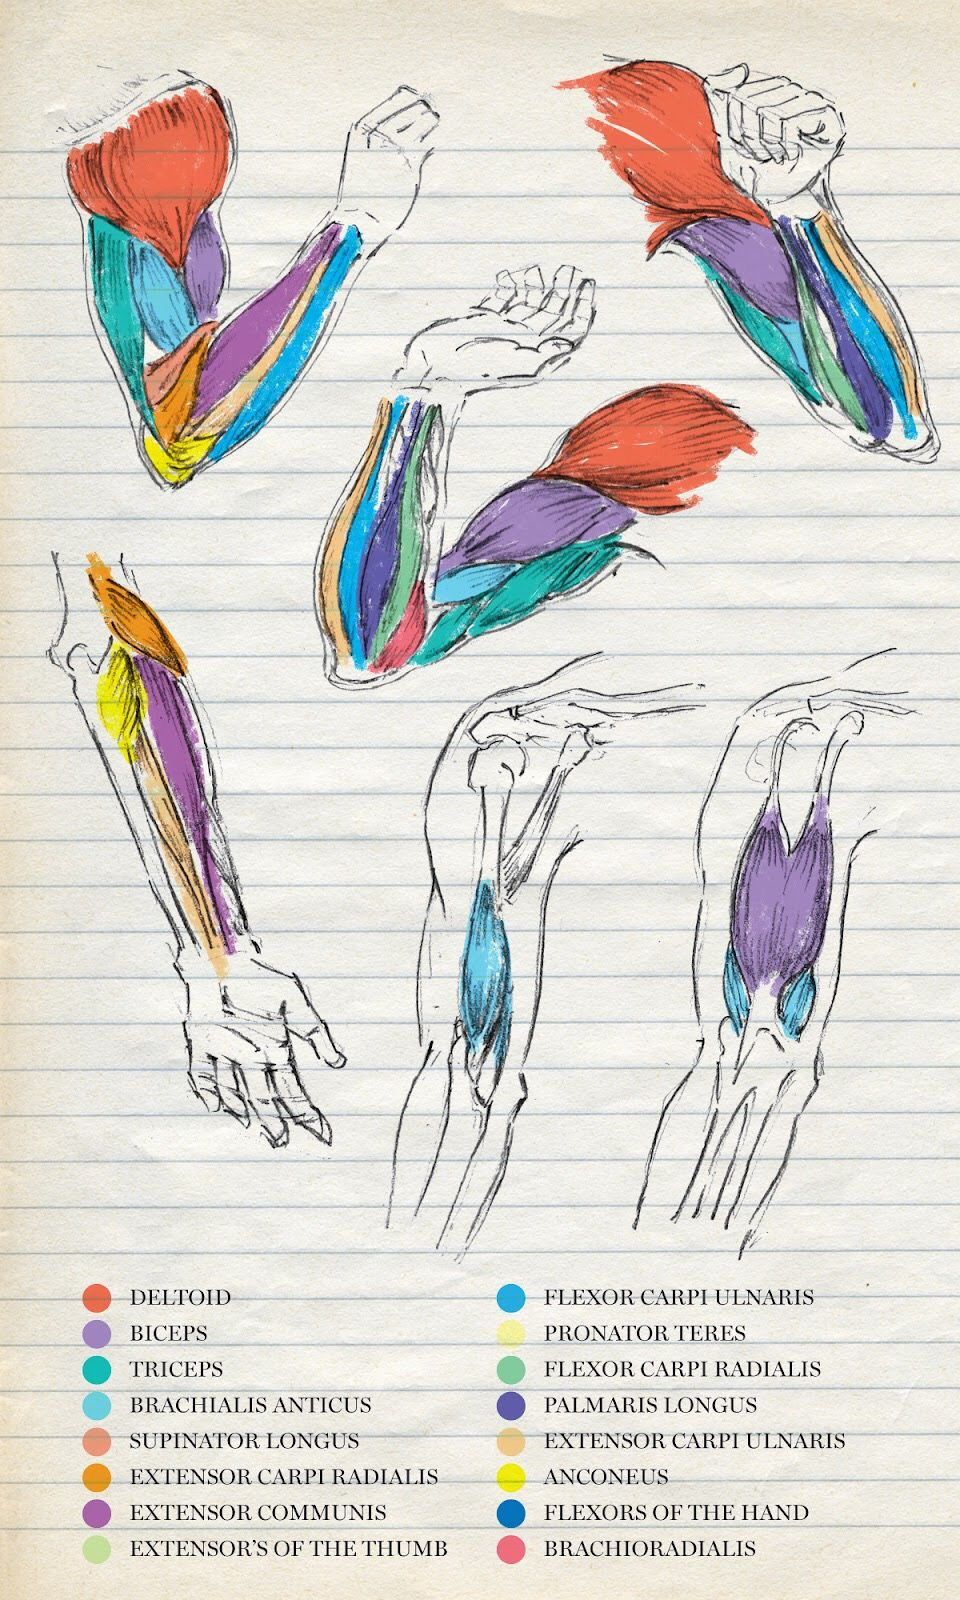 Pin de Anne Castillo en Apuntes med | Pinterest | Medicina, Anatomía ...